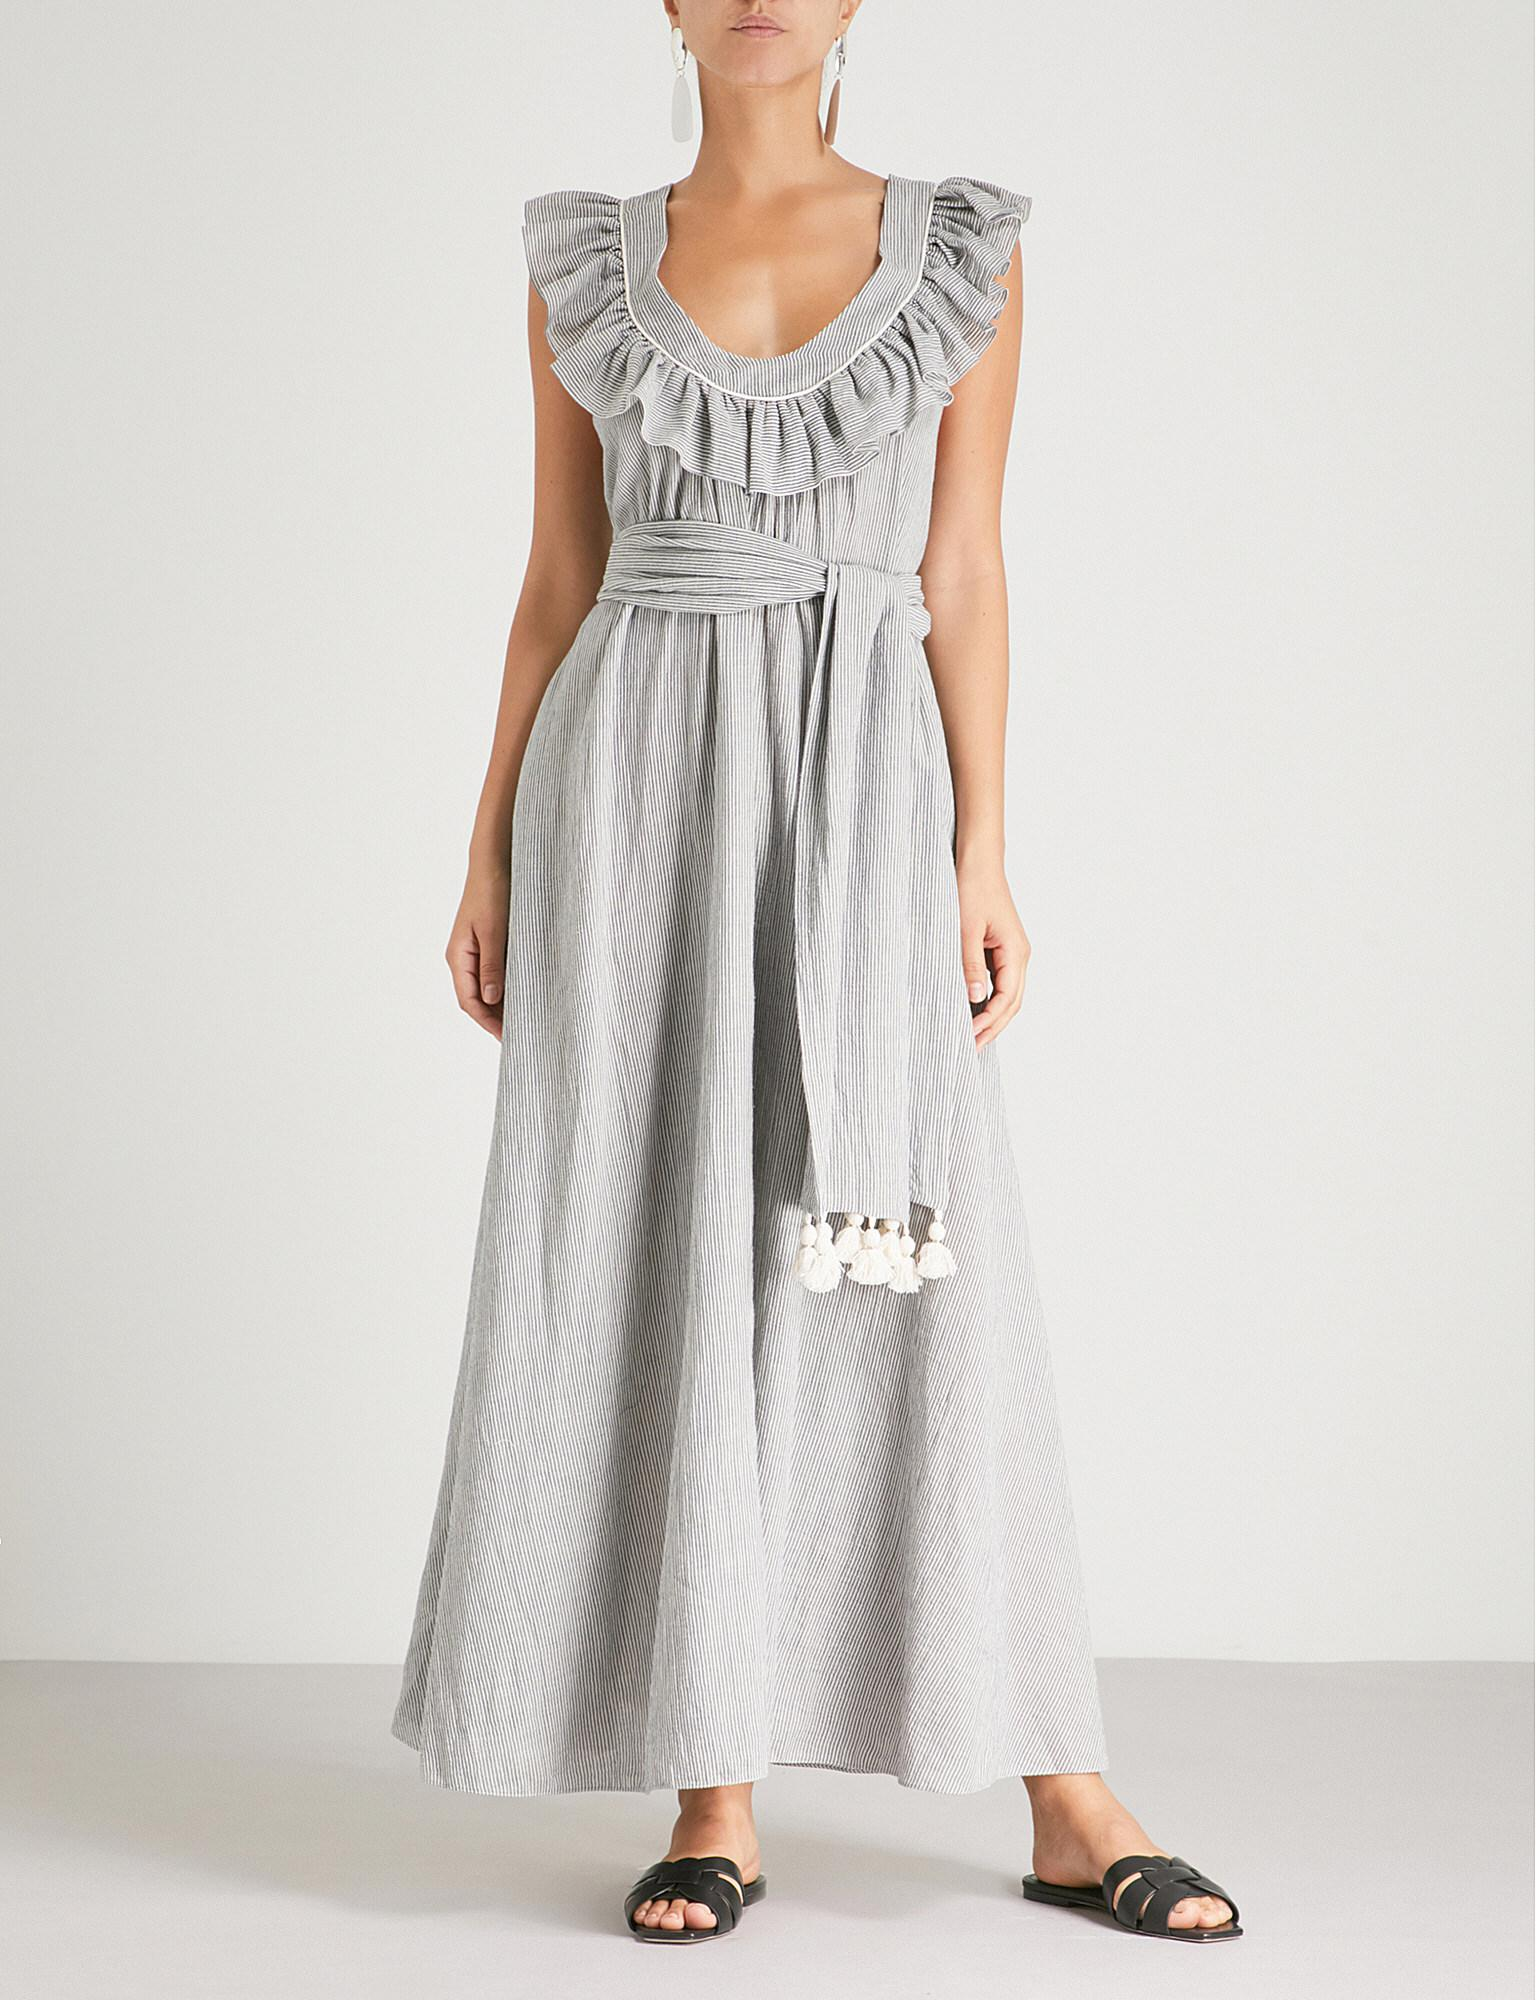 Geraldine cotton-blend maxi dress Three Graces London Cheap Sale Low Shipping 14EP5sLZ